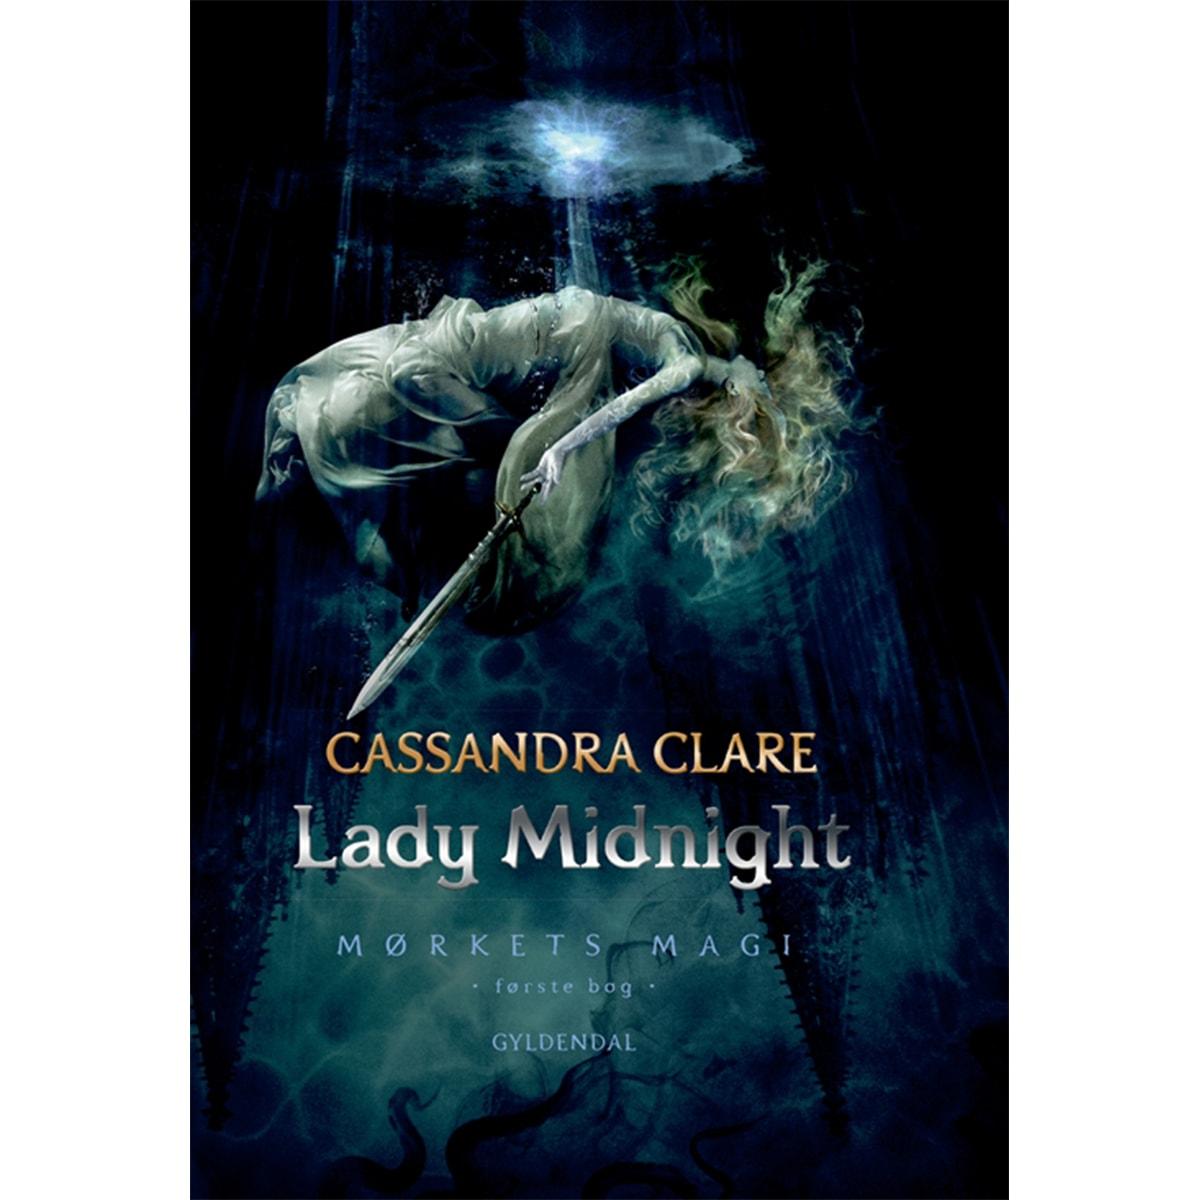 Af Cassandra Clare